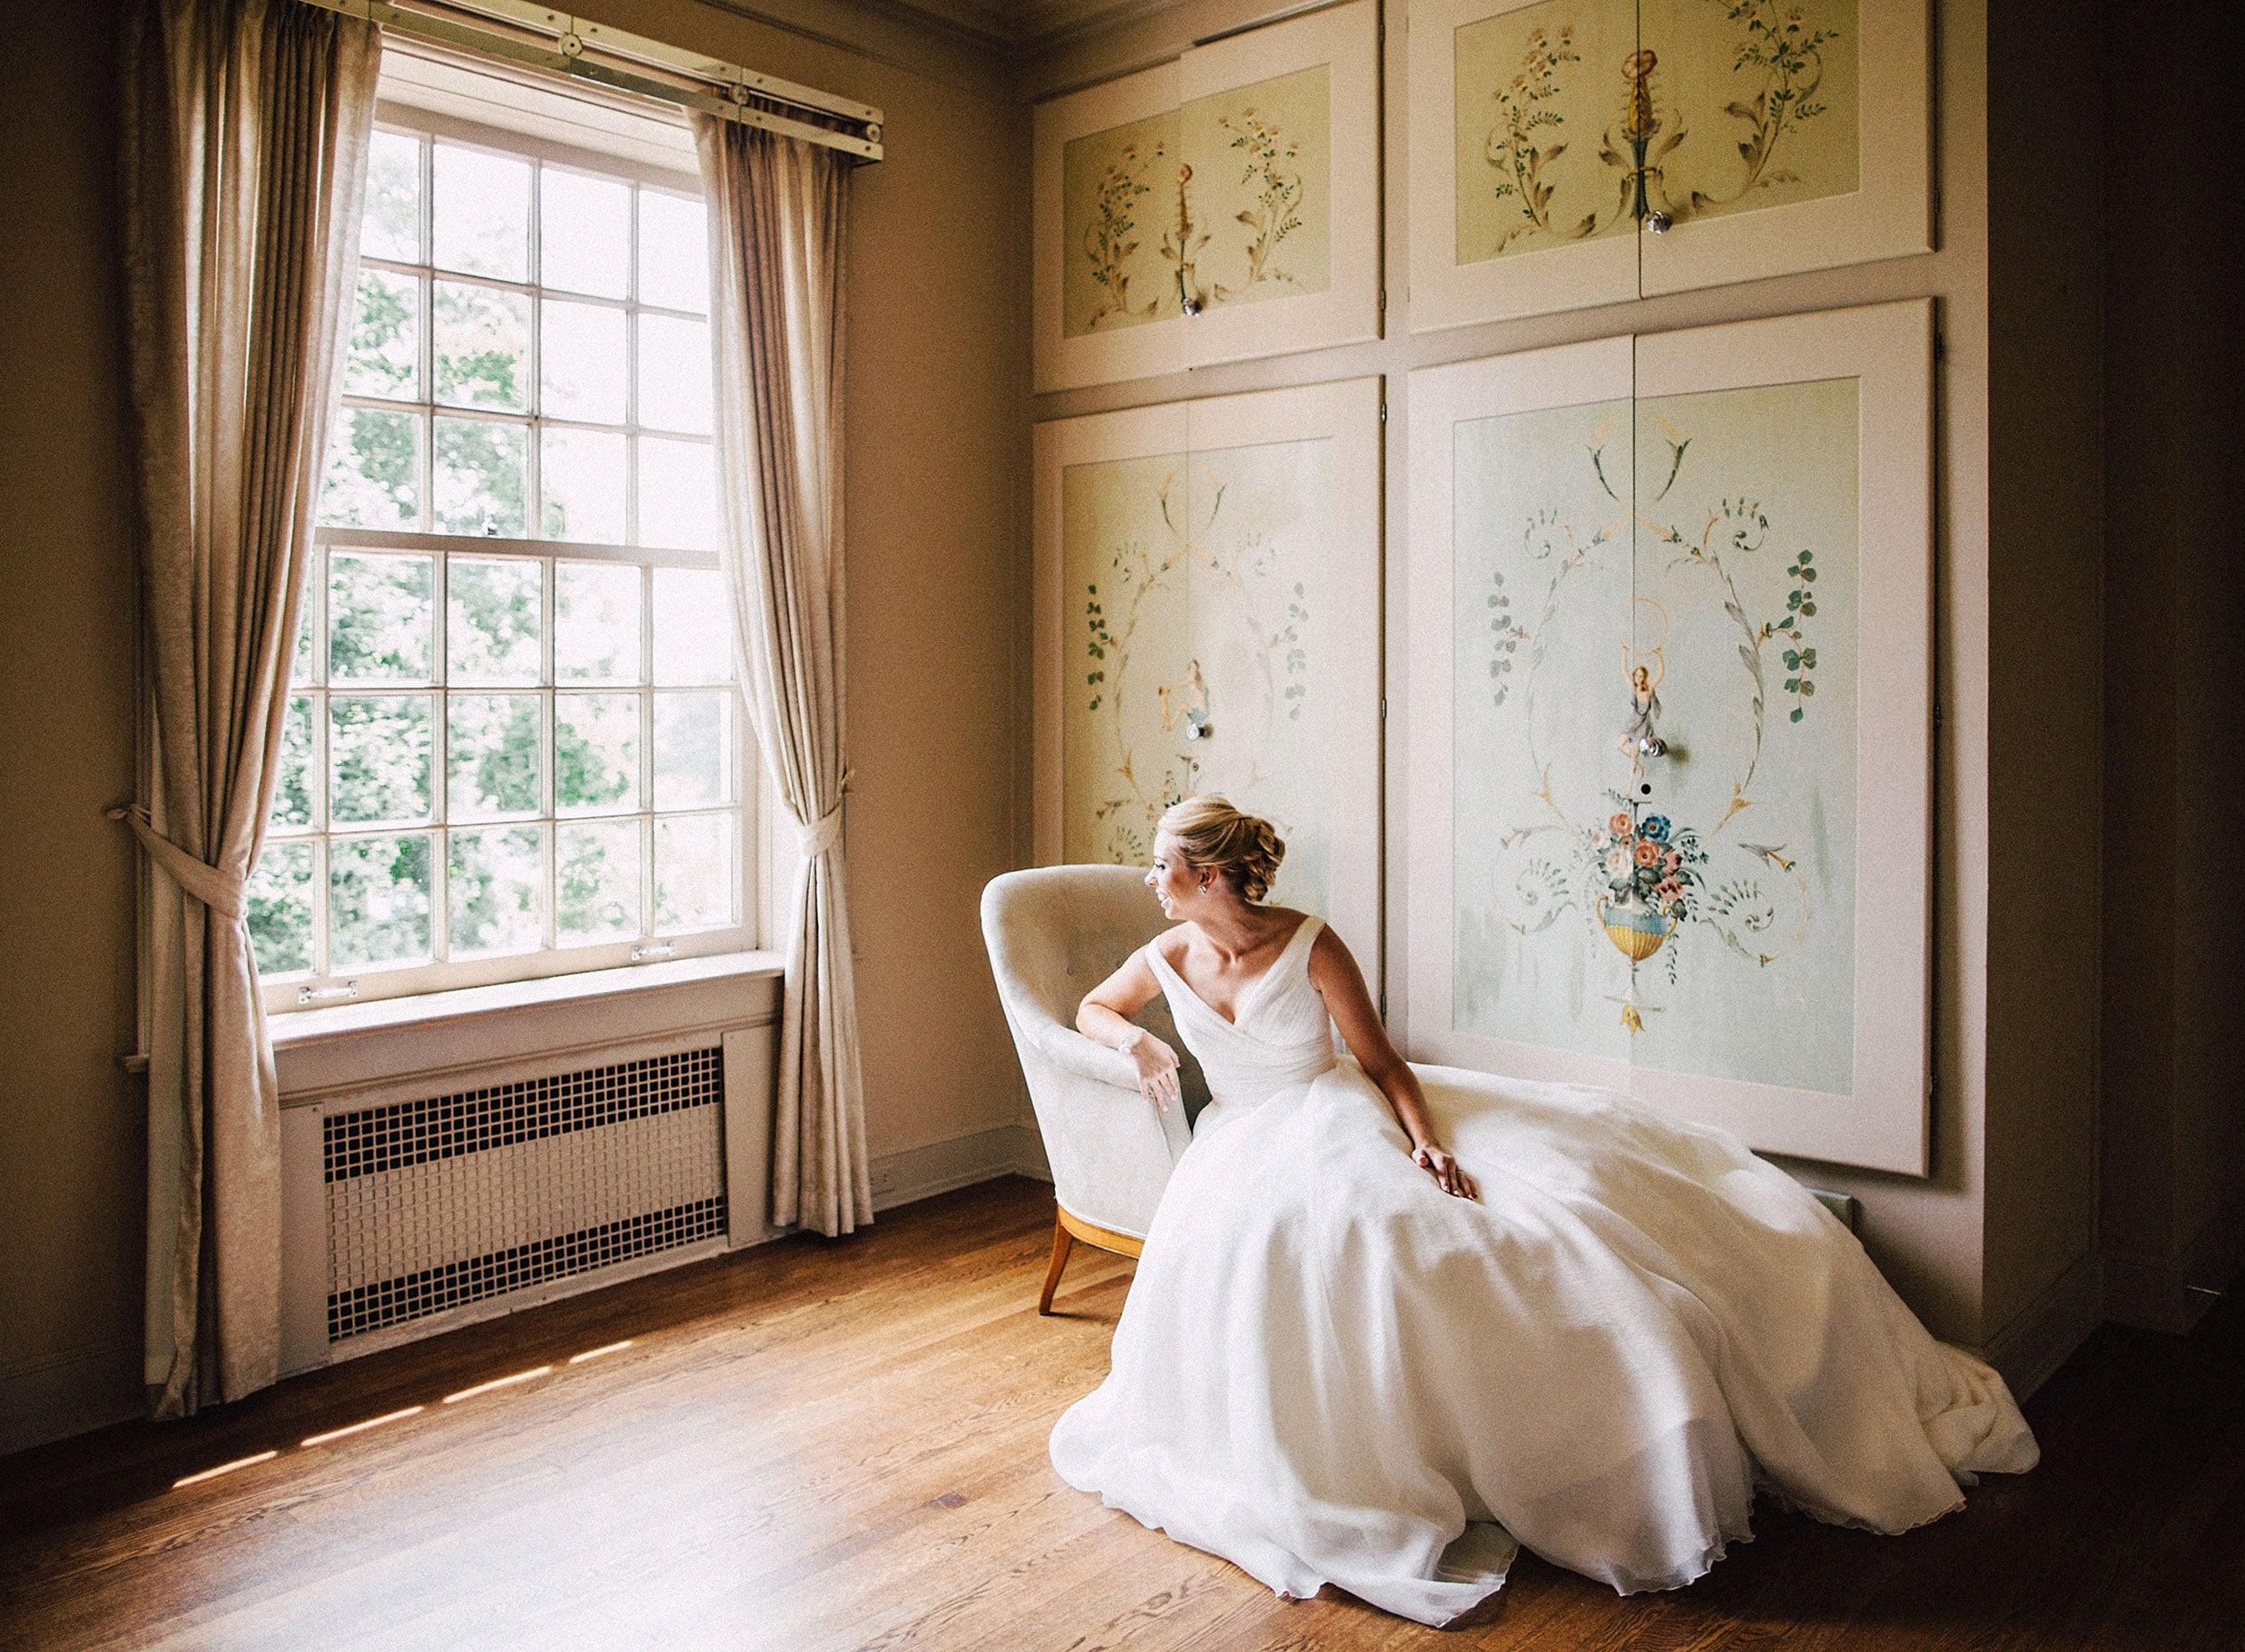 spindletop-lexington-wedding-photographer-009.JPG